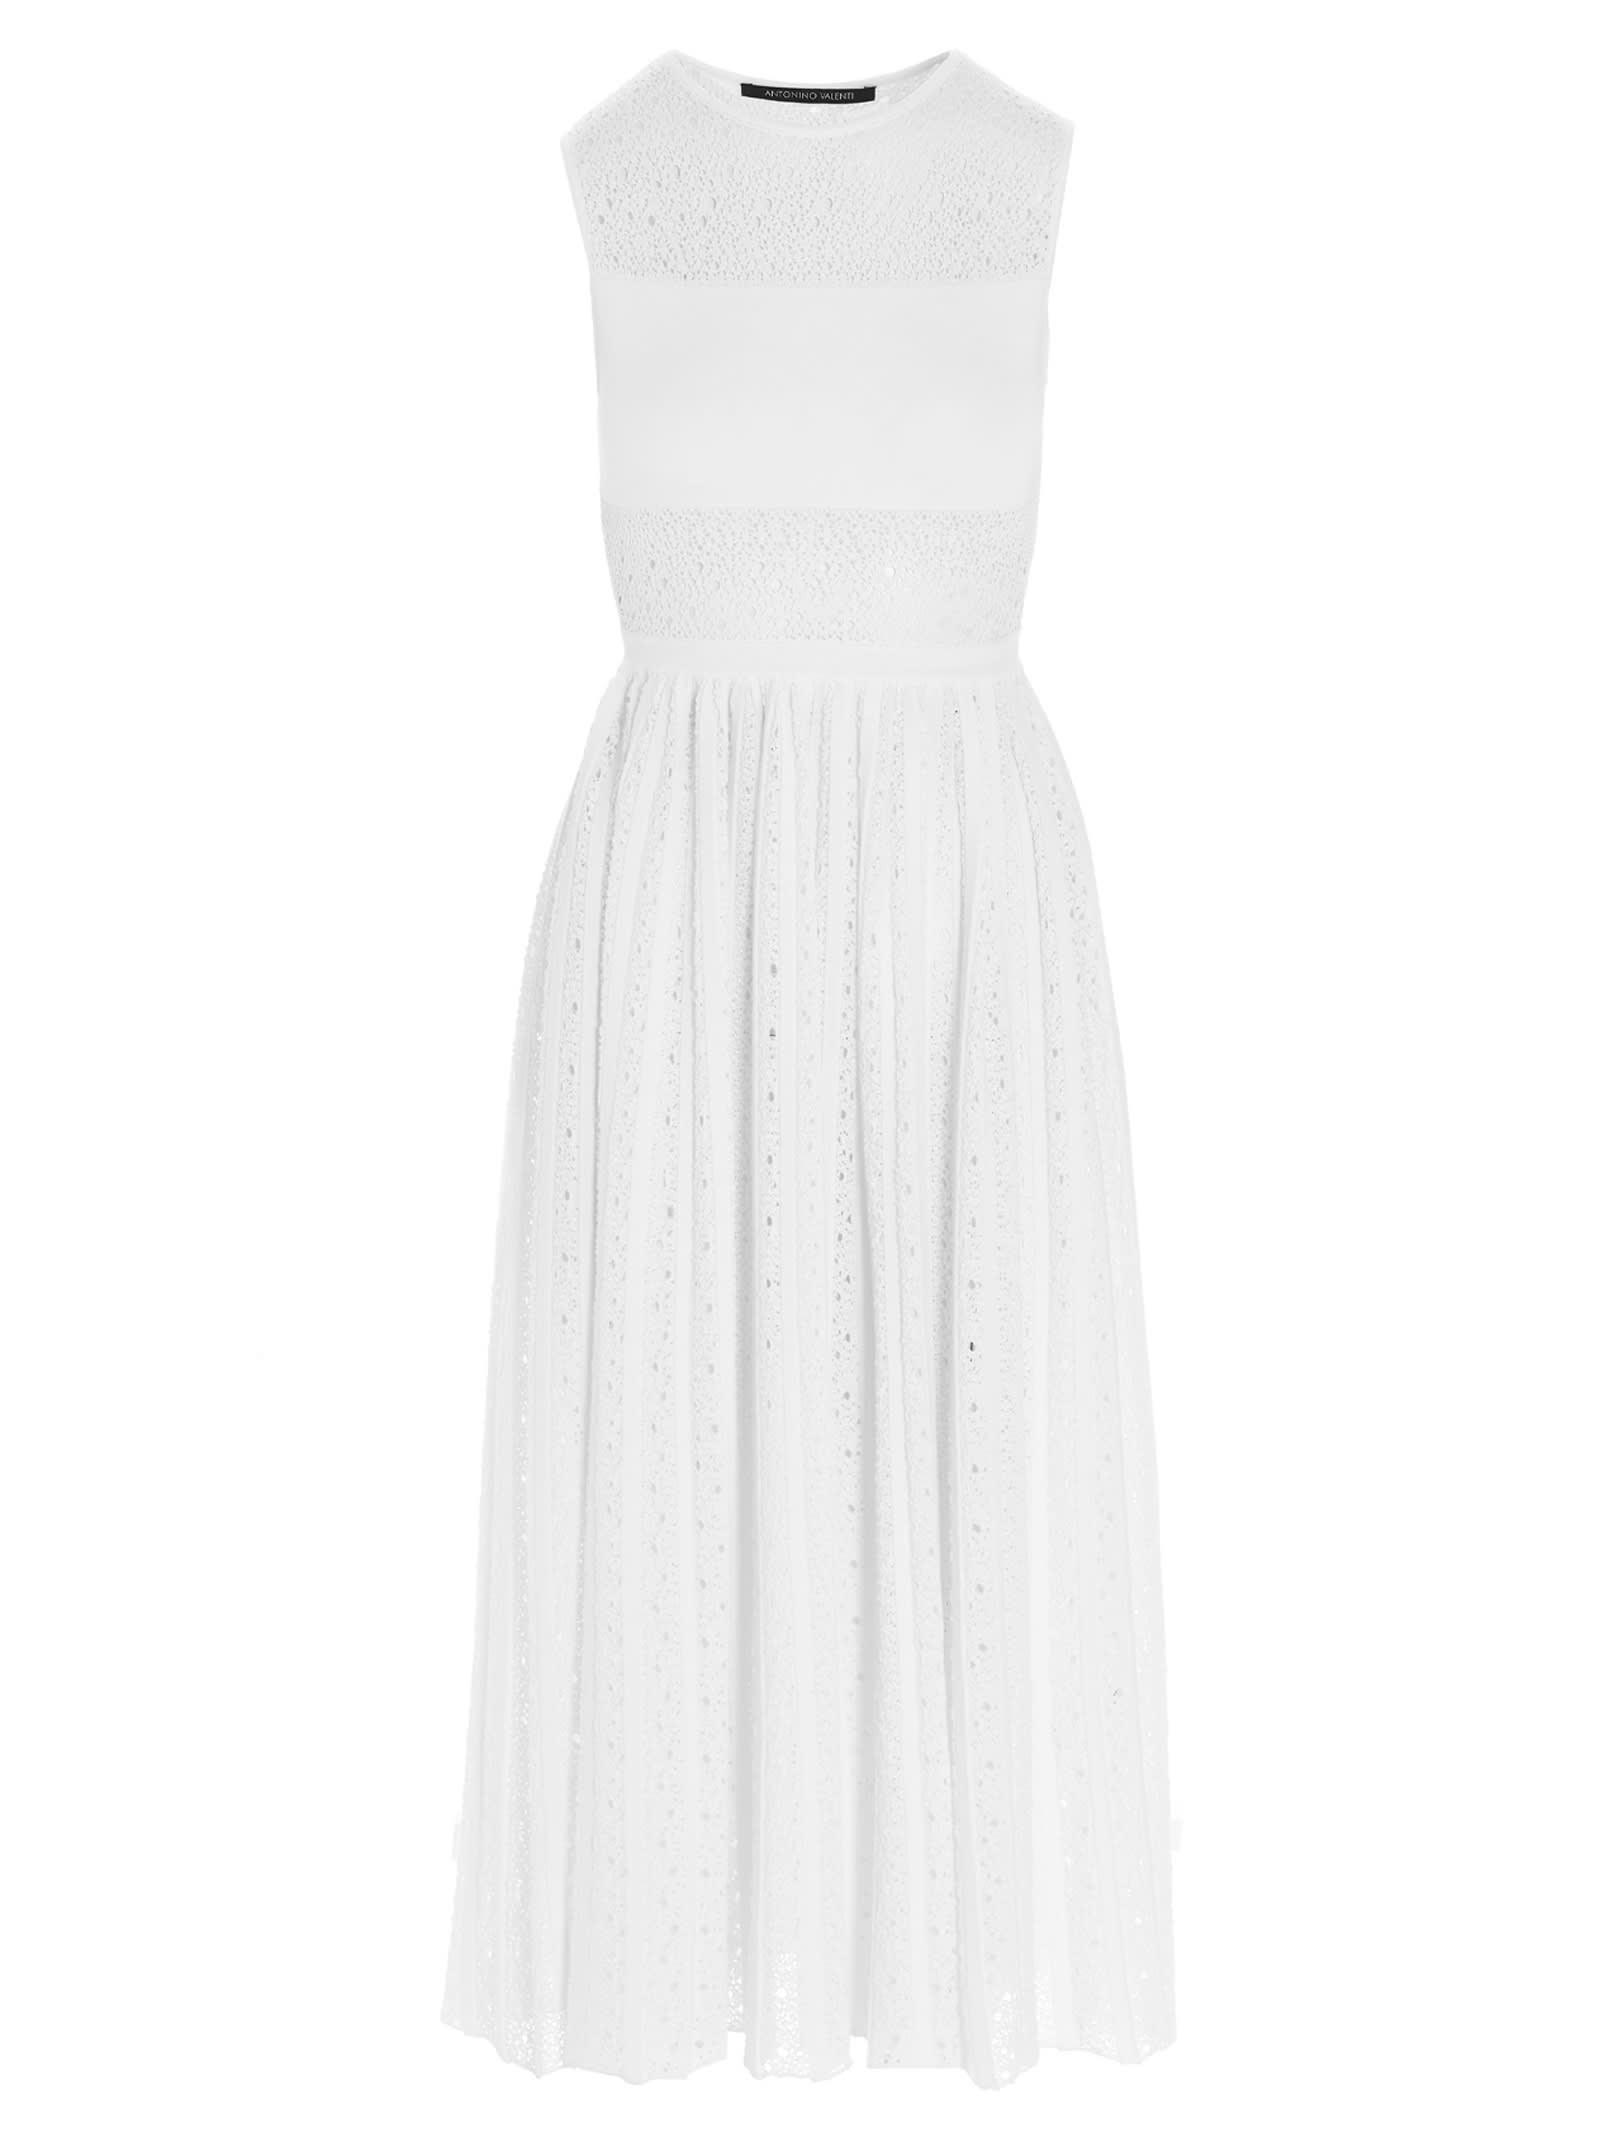 octavia Dress